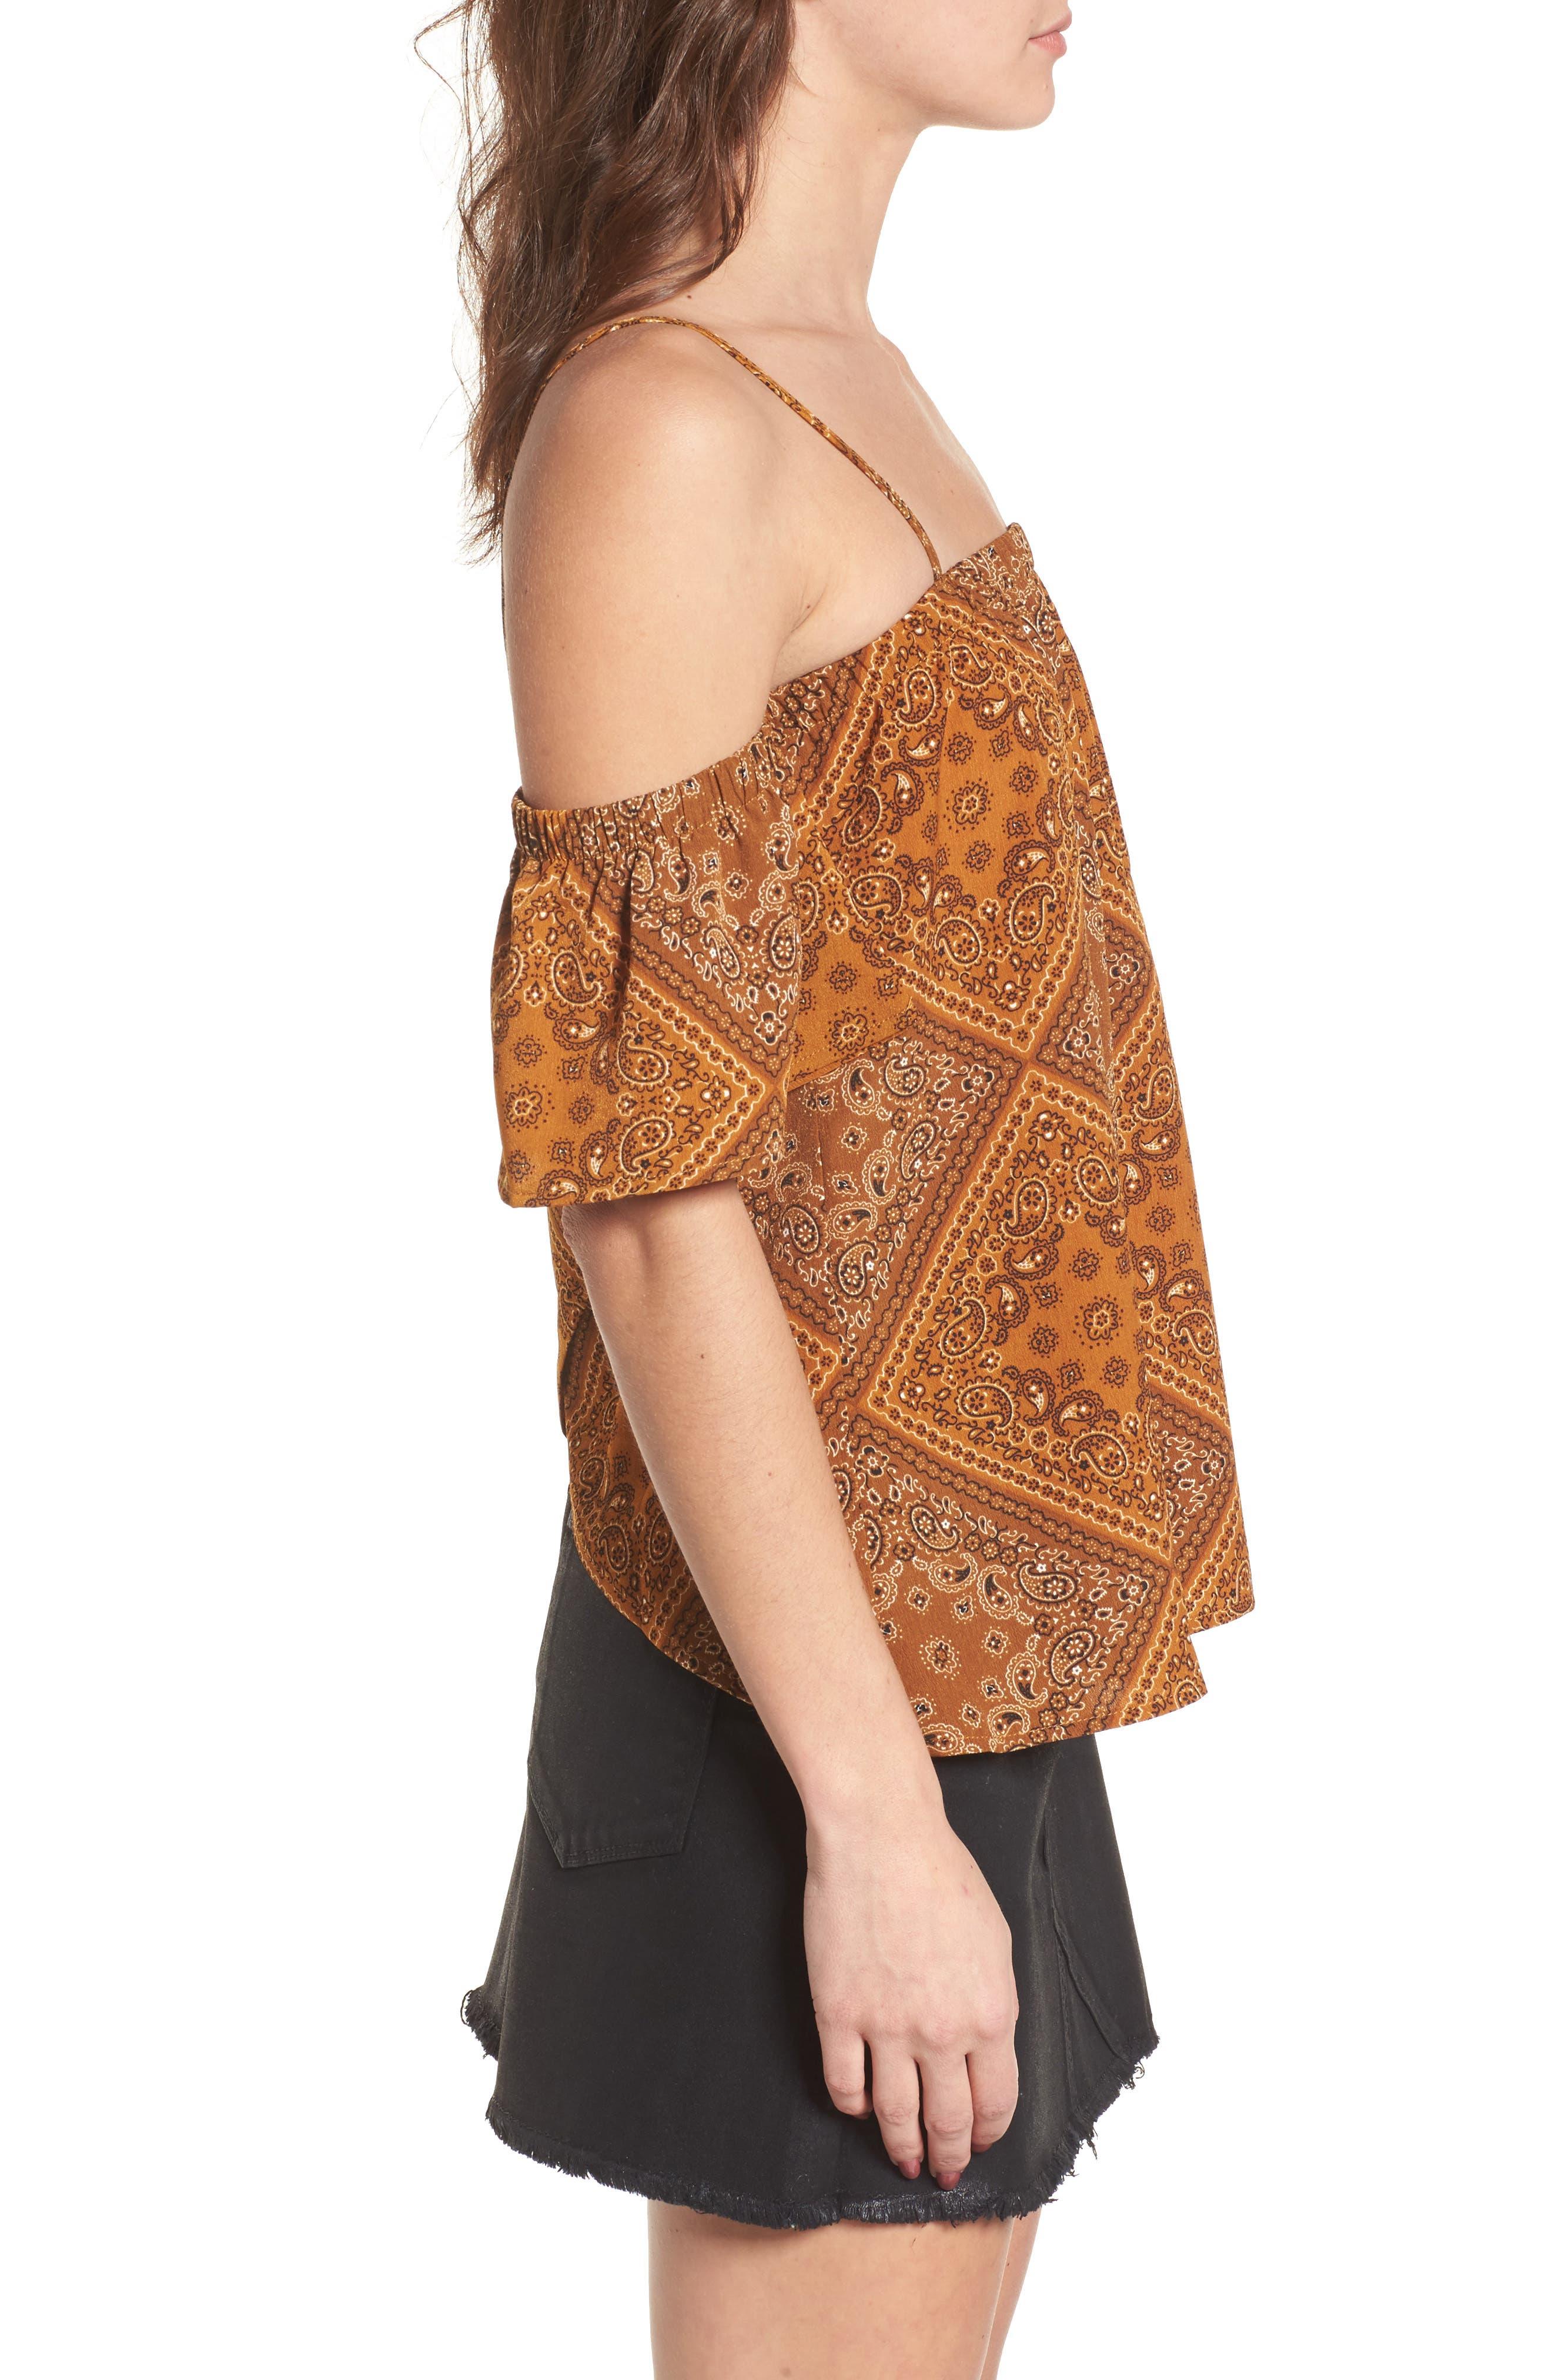 Alternate Image 3  - Lira Clothing Zeze Top